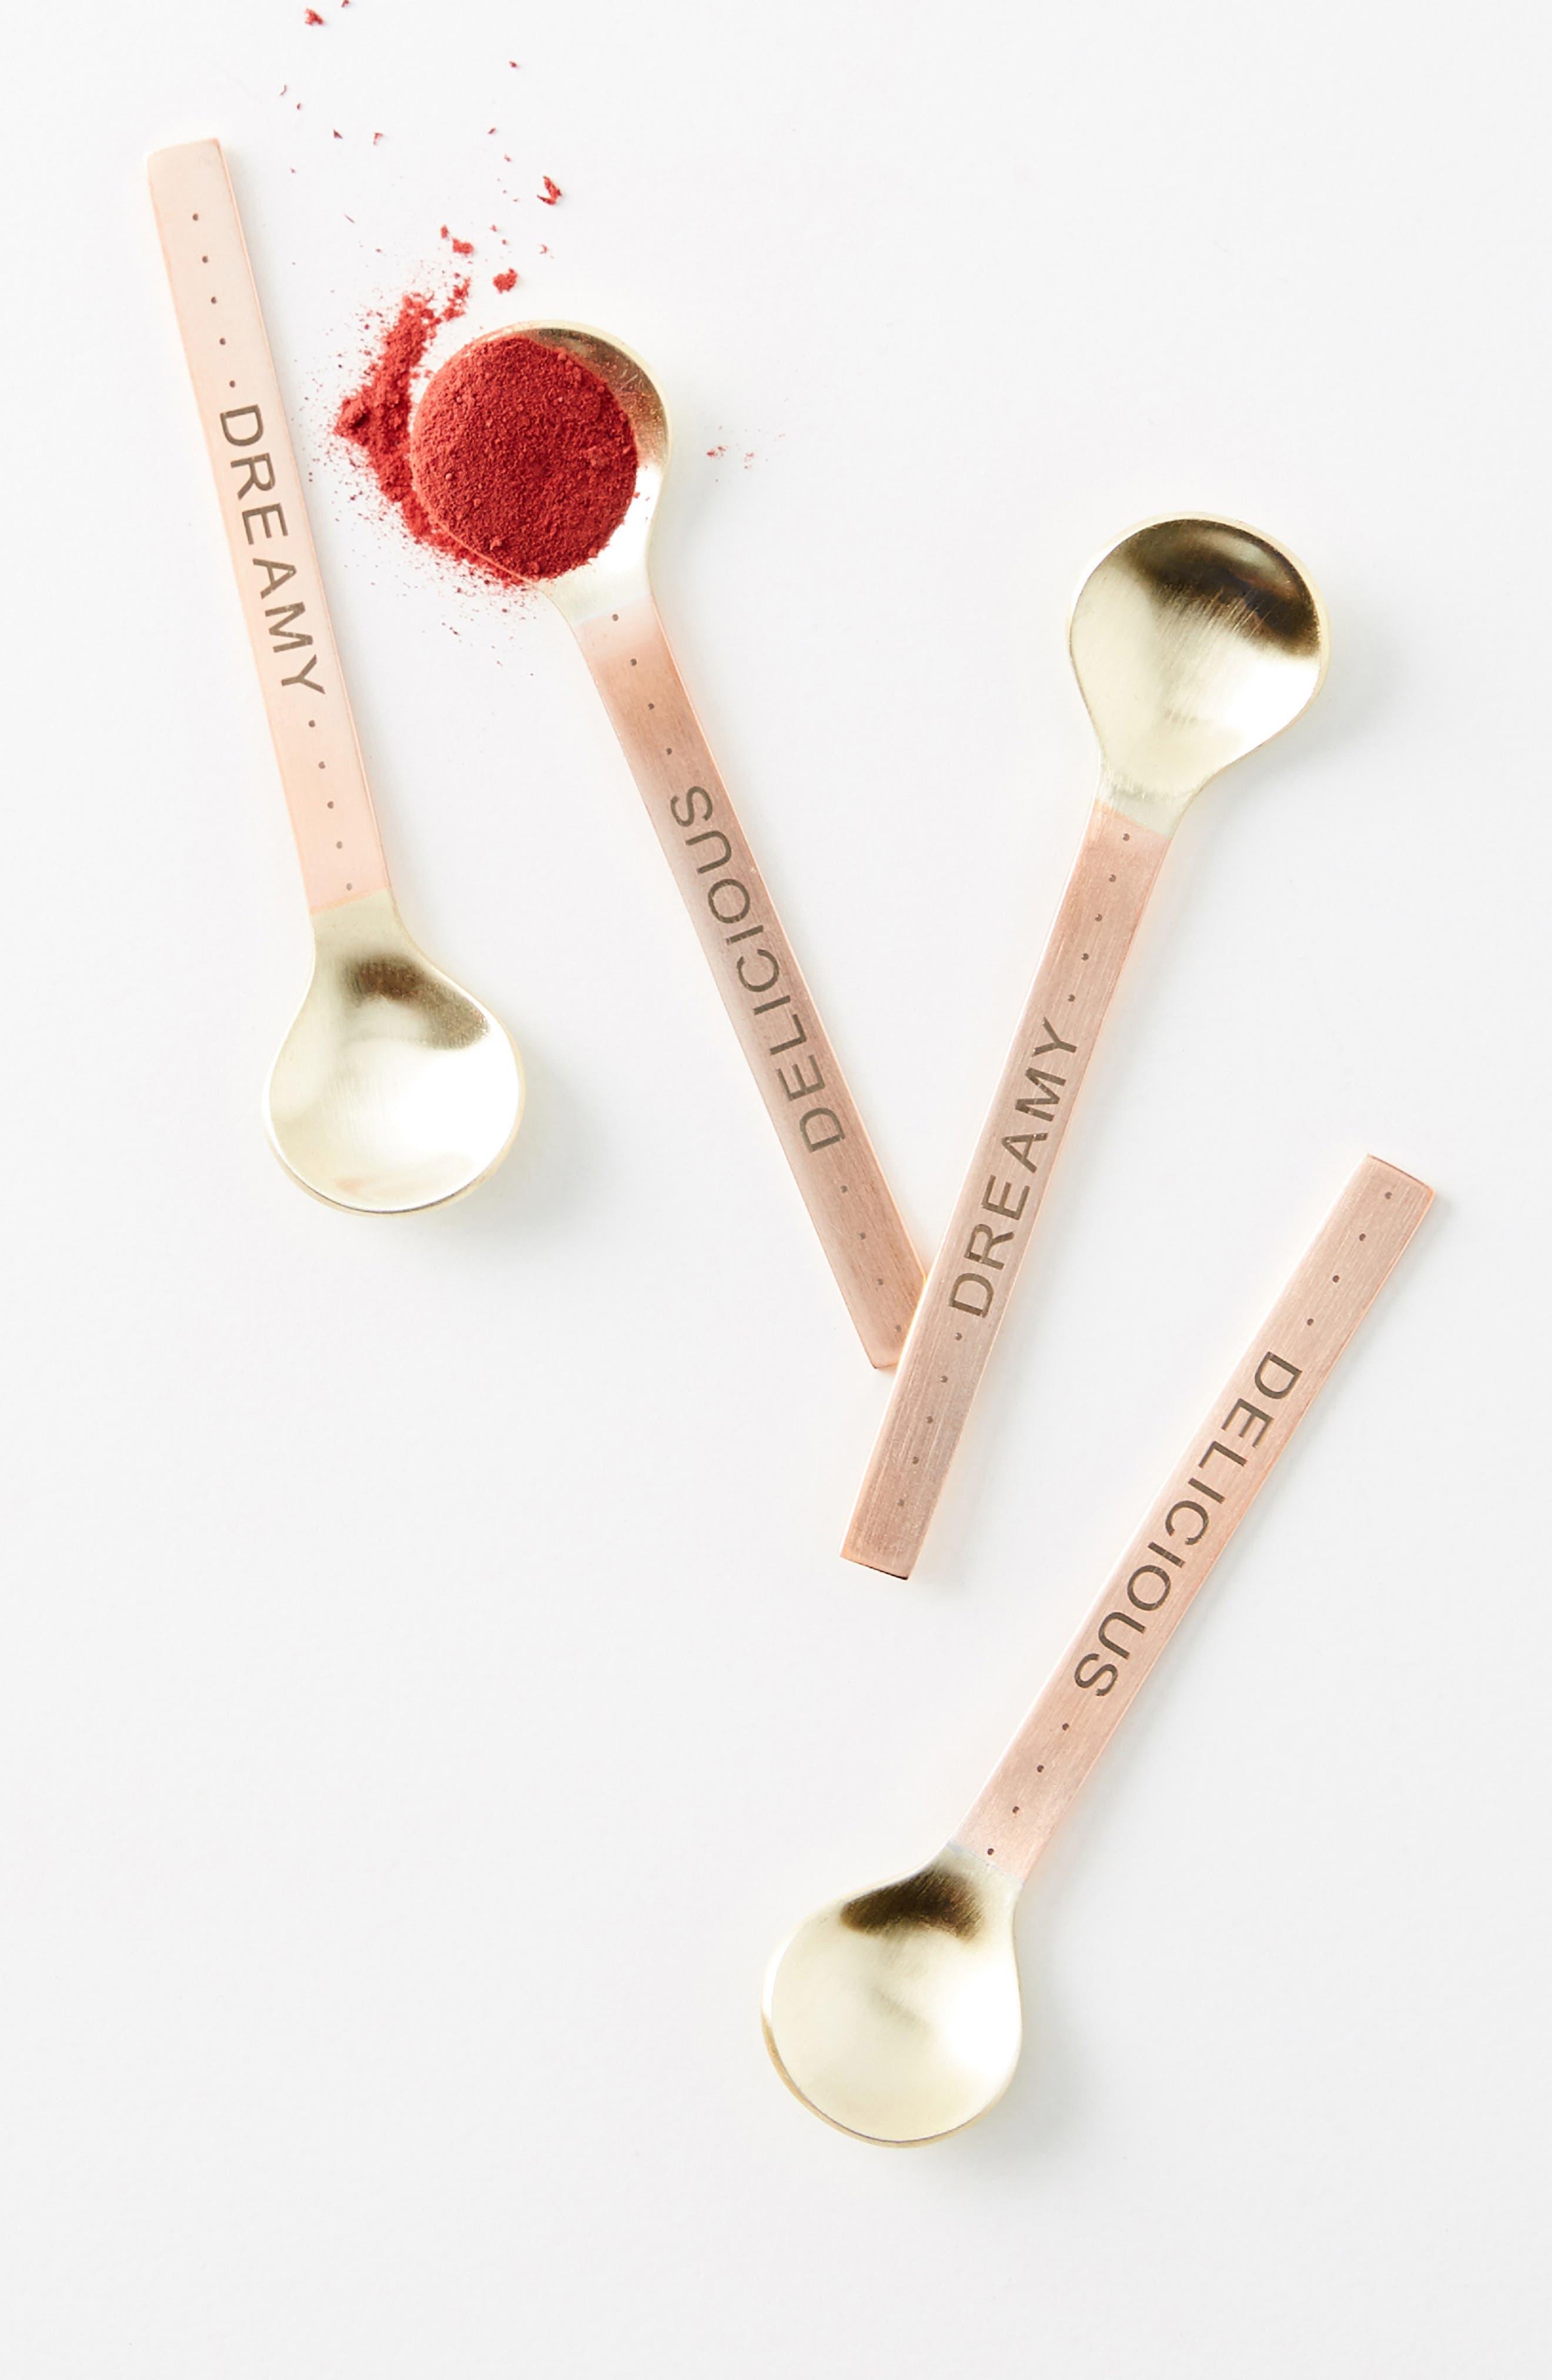 Albertina Set of 4 Condiment Spoons,                             Main thumbnail 1, color,                             220